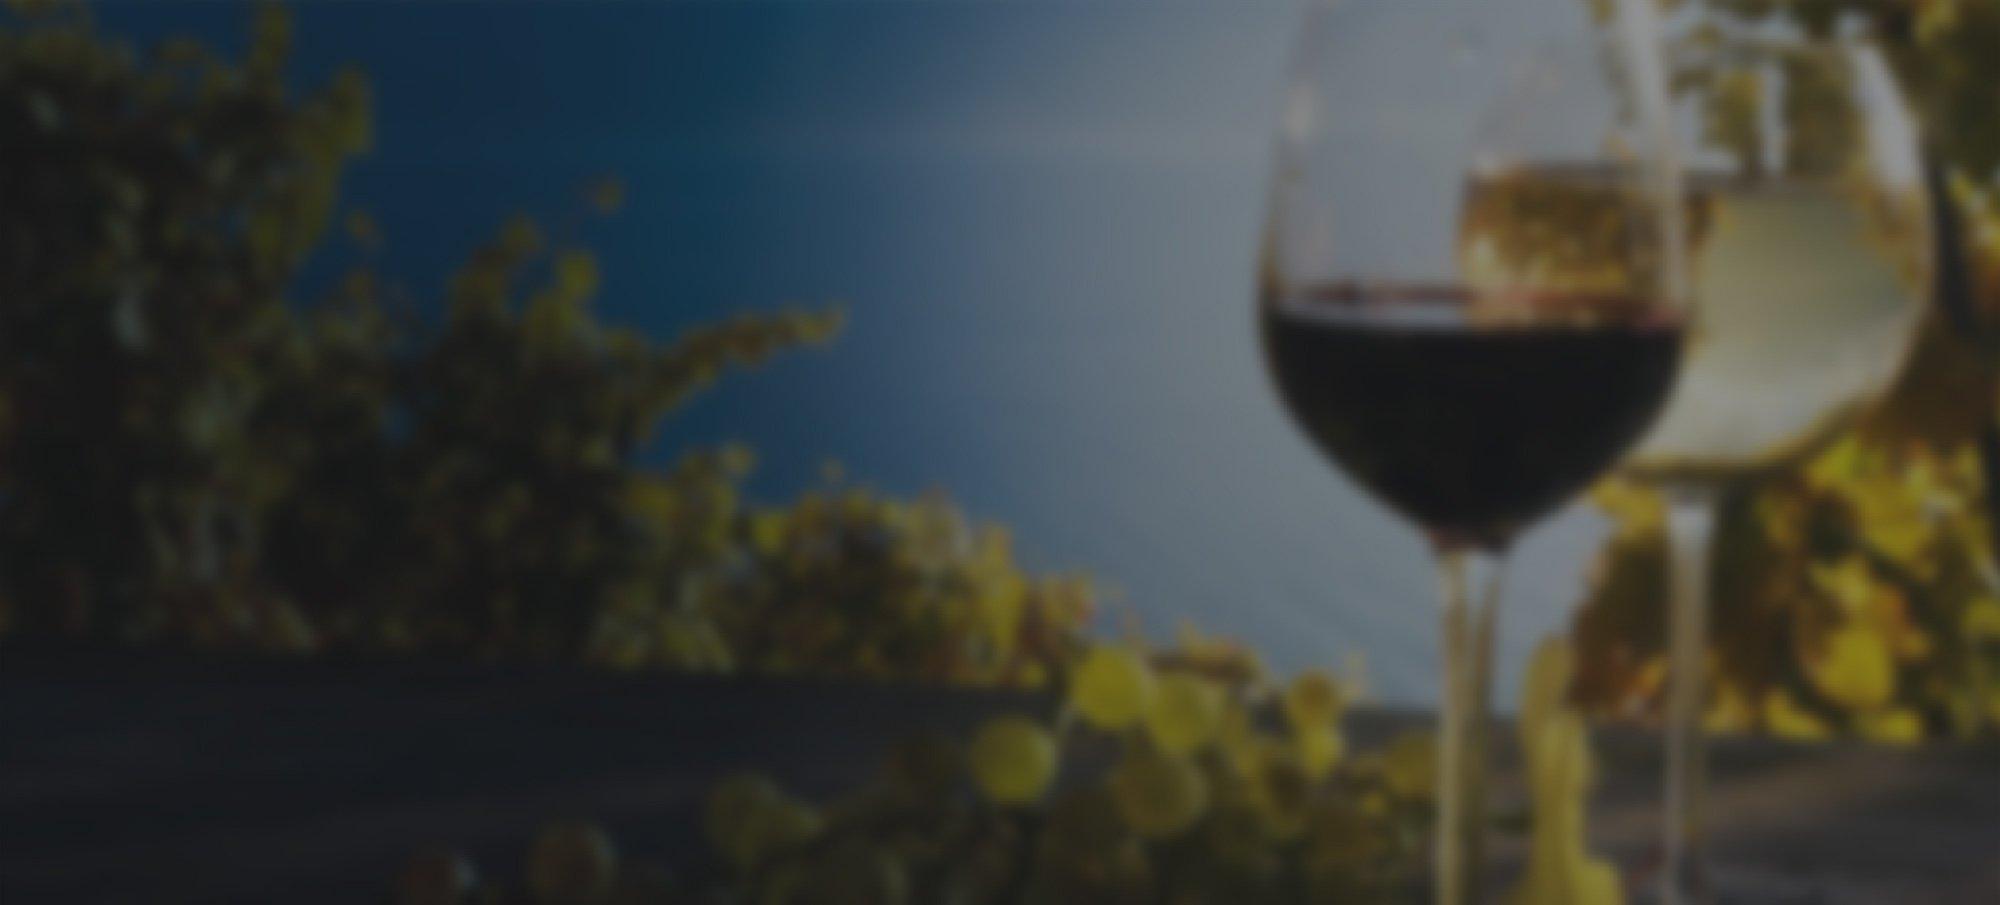 Red u0026 White wine in glasses Total